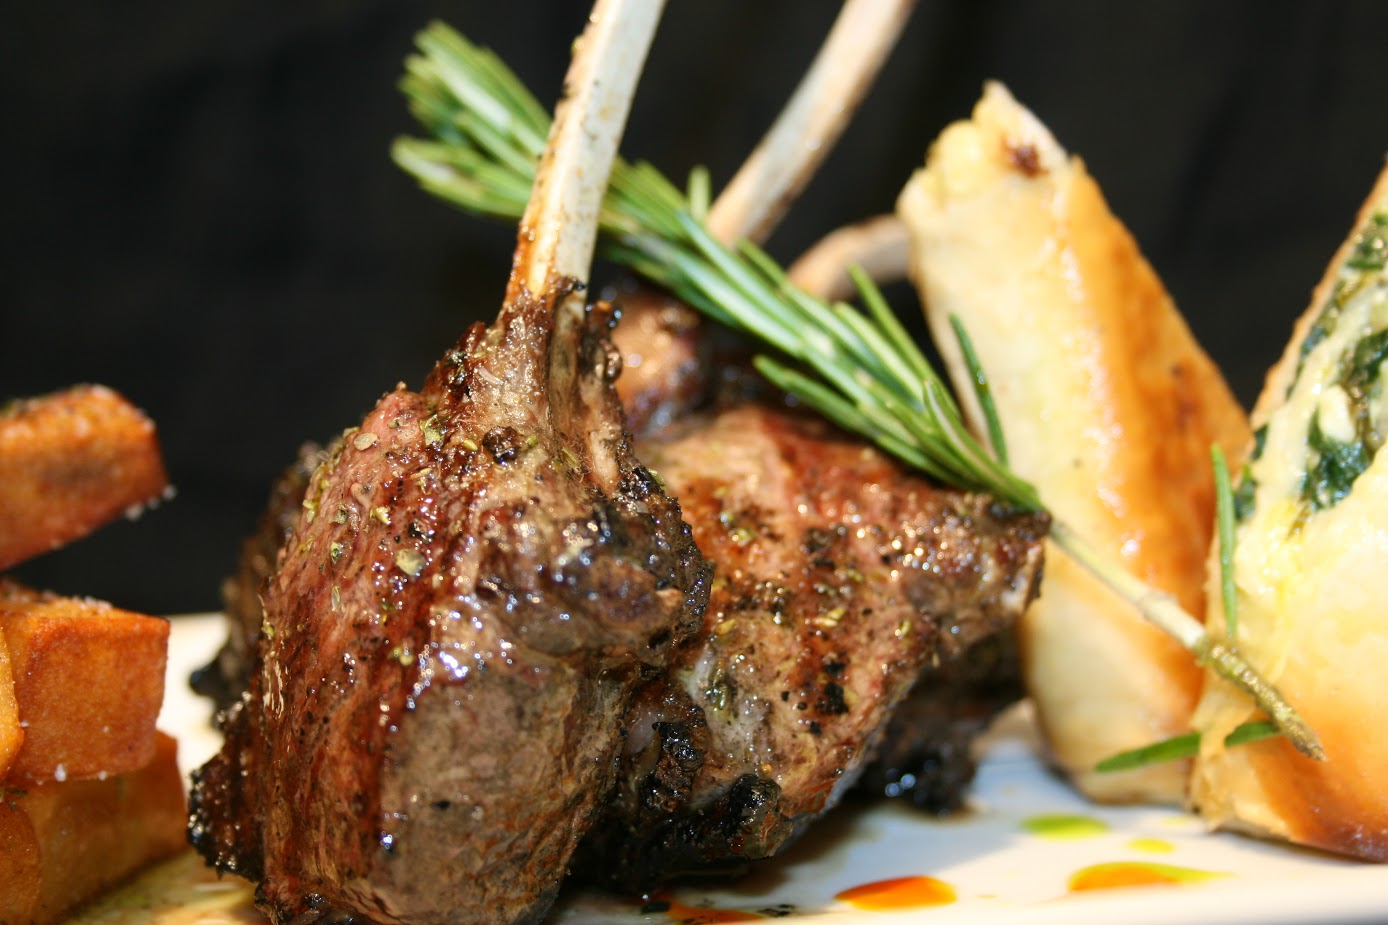 plates of greek food